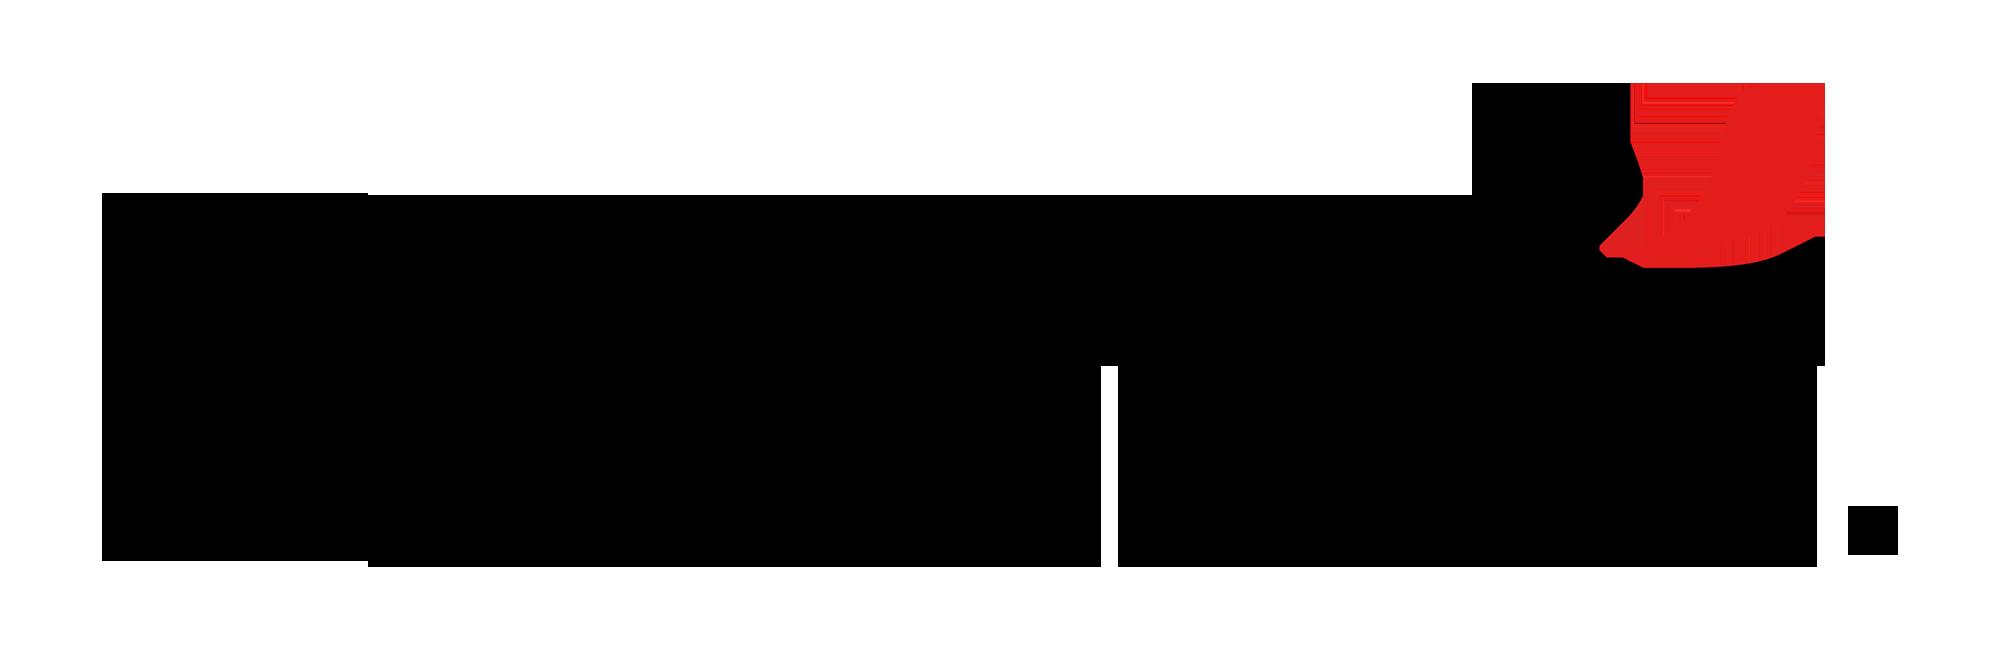 Nescafe Logo Nescafe Symbol Meaning History And Evolution